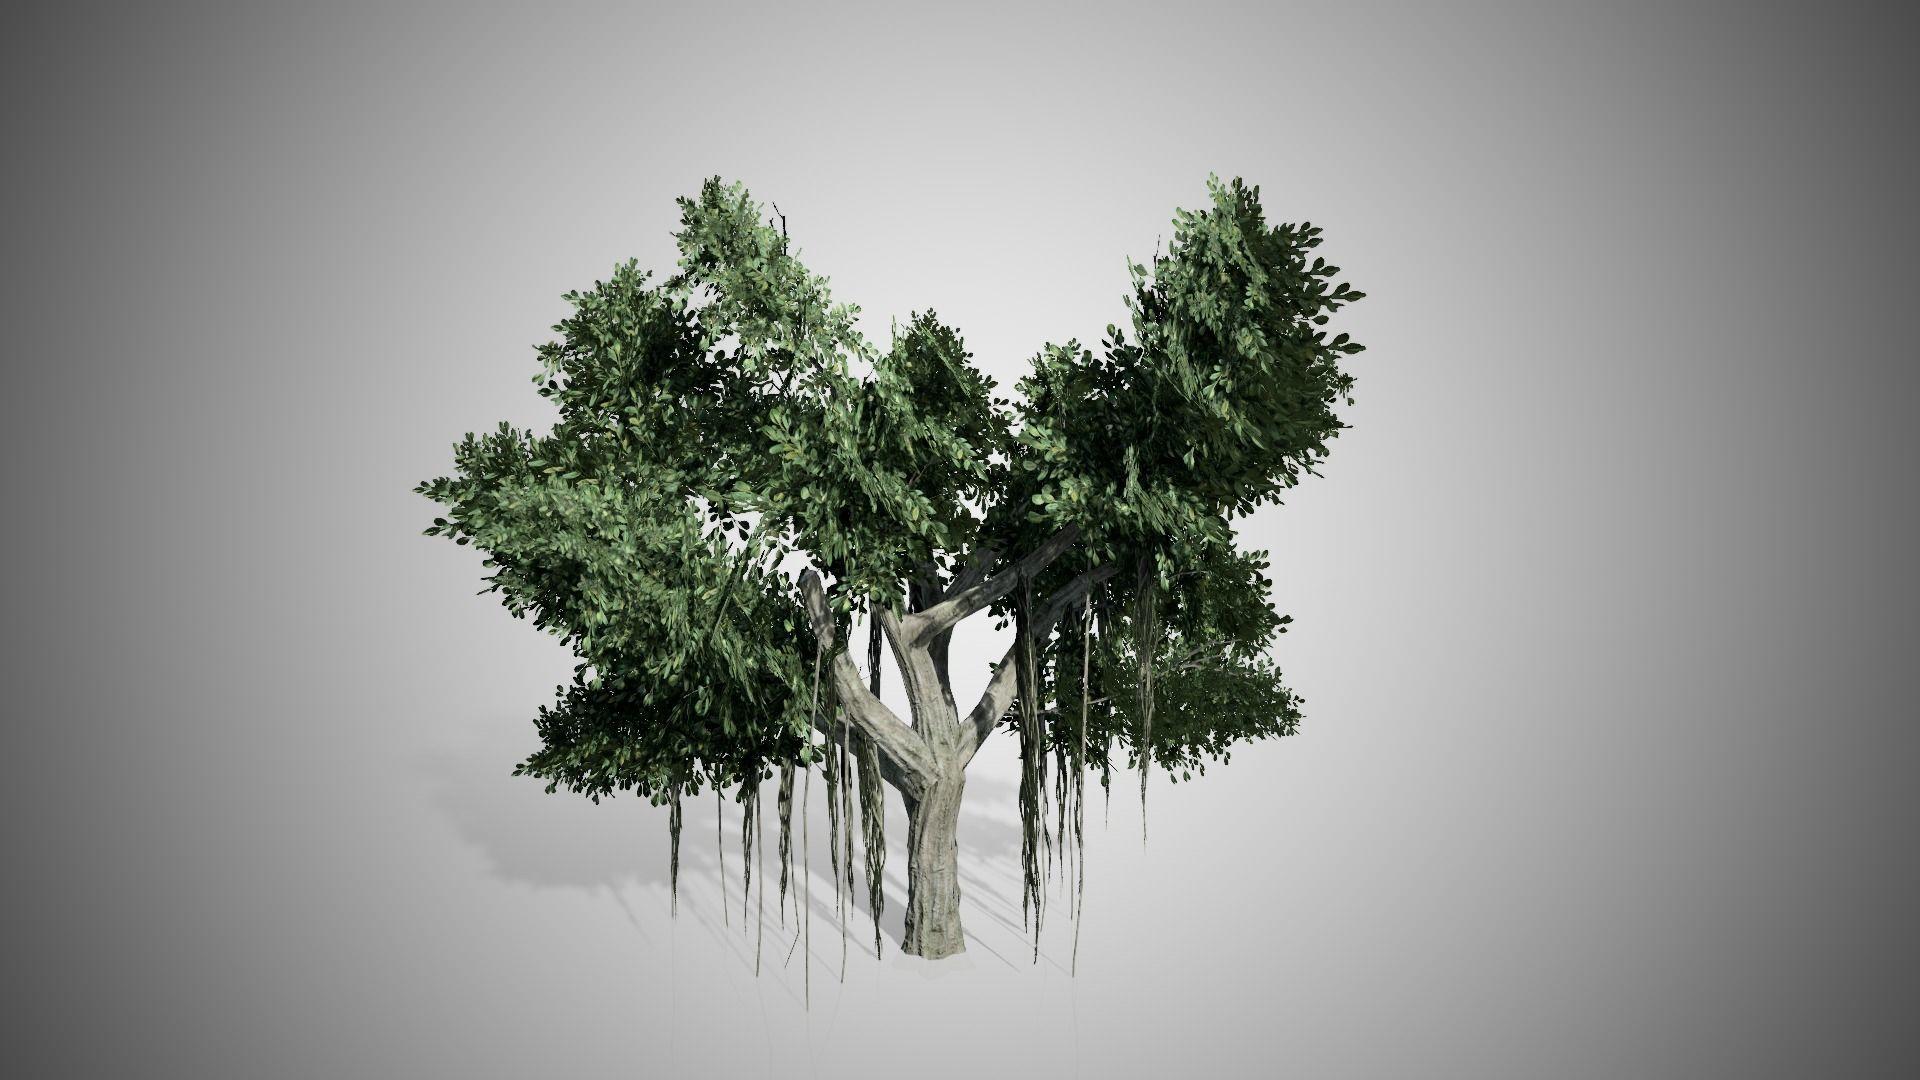 Chinese Banyan Tree